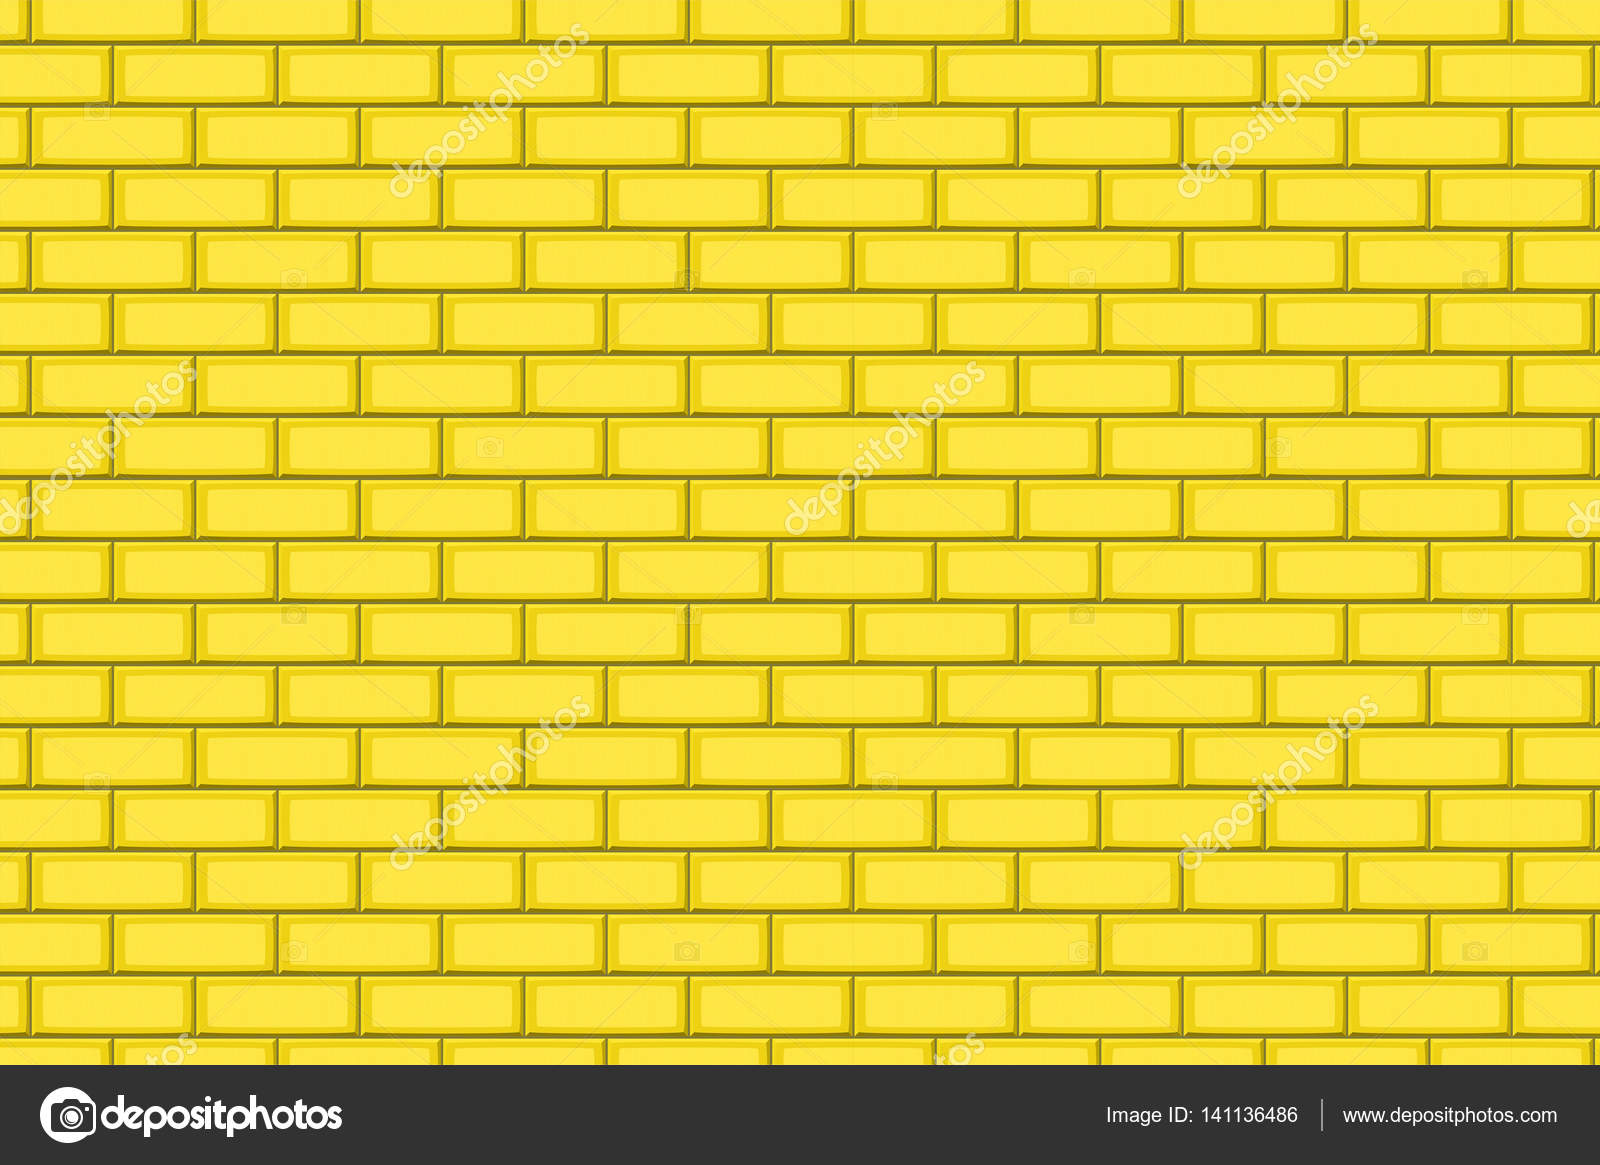 Cartoon hand drown golden realistic seamless brick wall